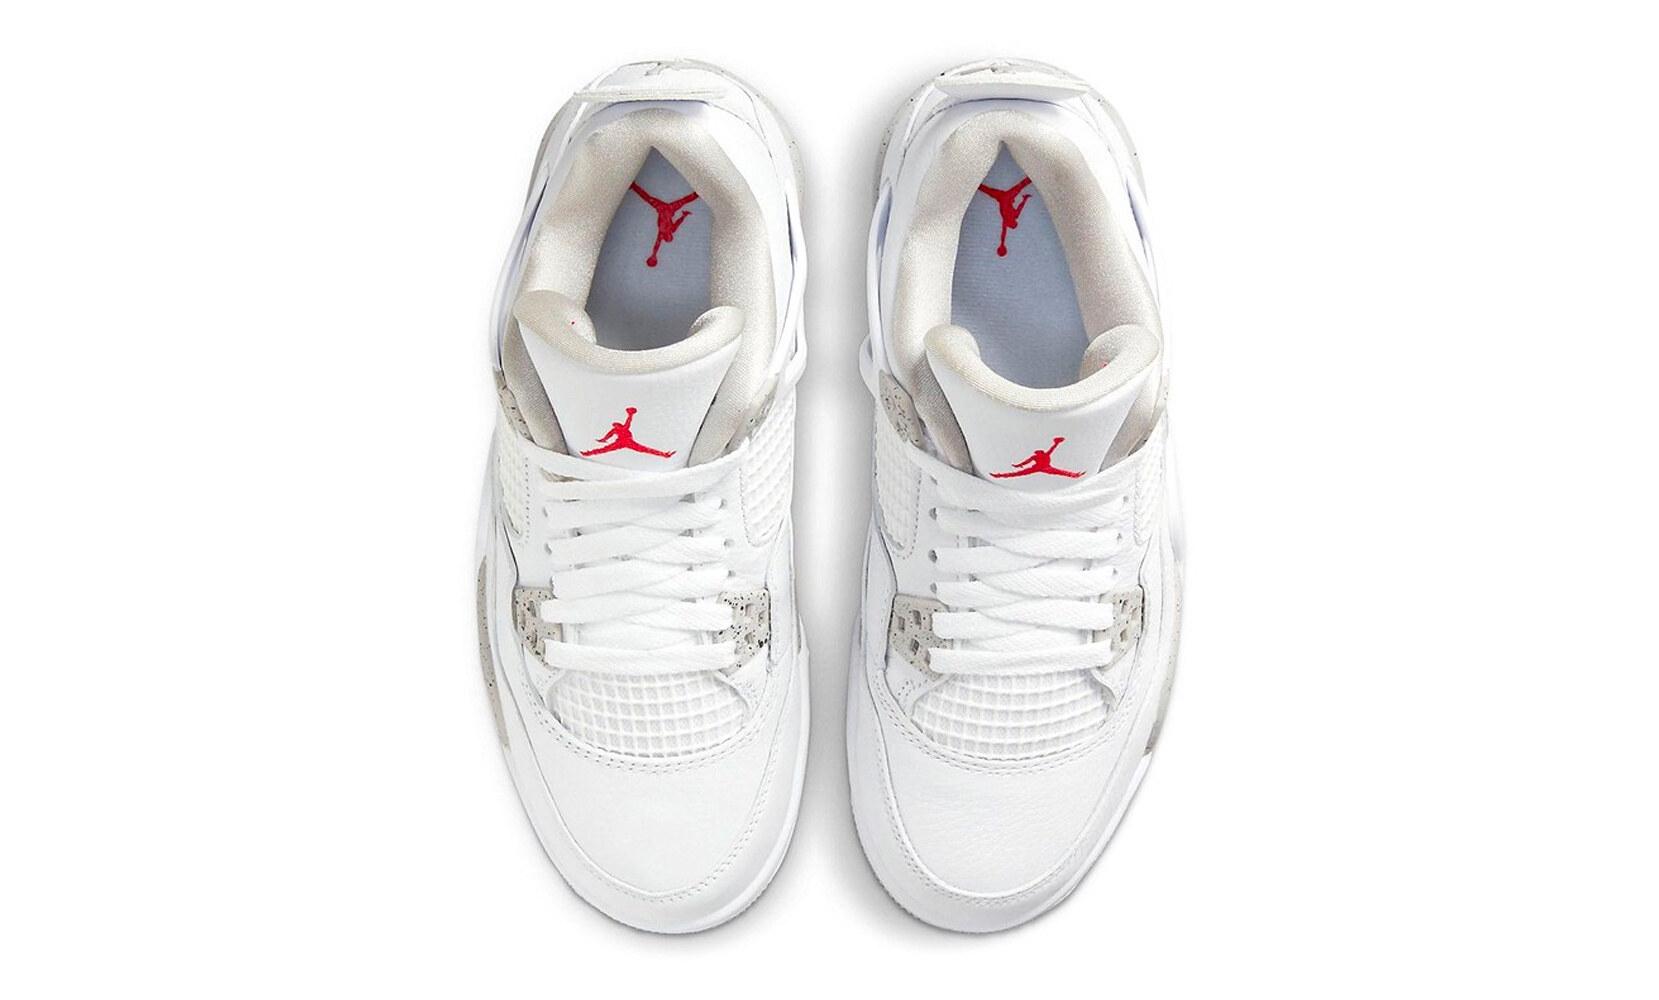 Air Jordan 4 u201cWhite /Tech Grayu201d